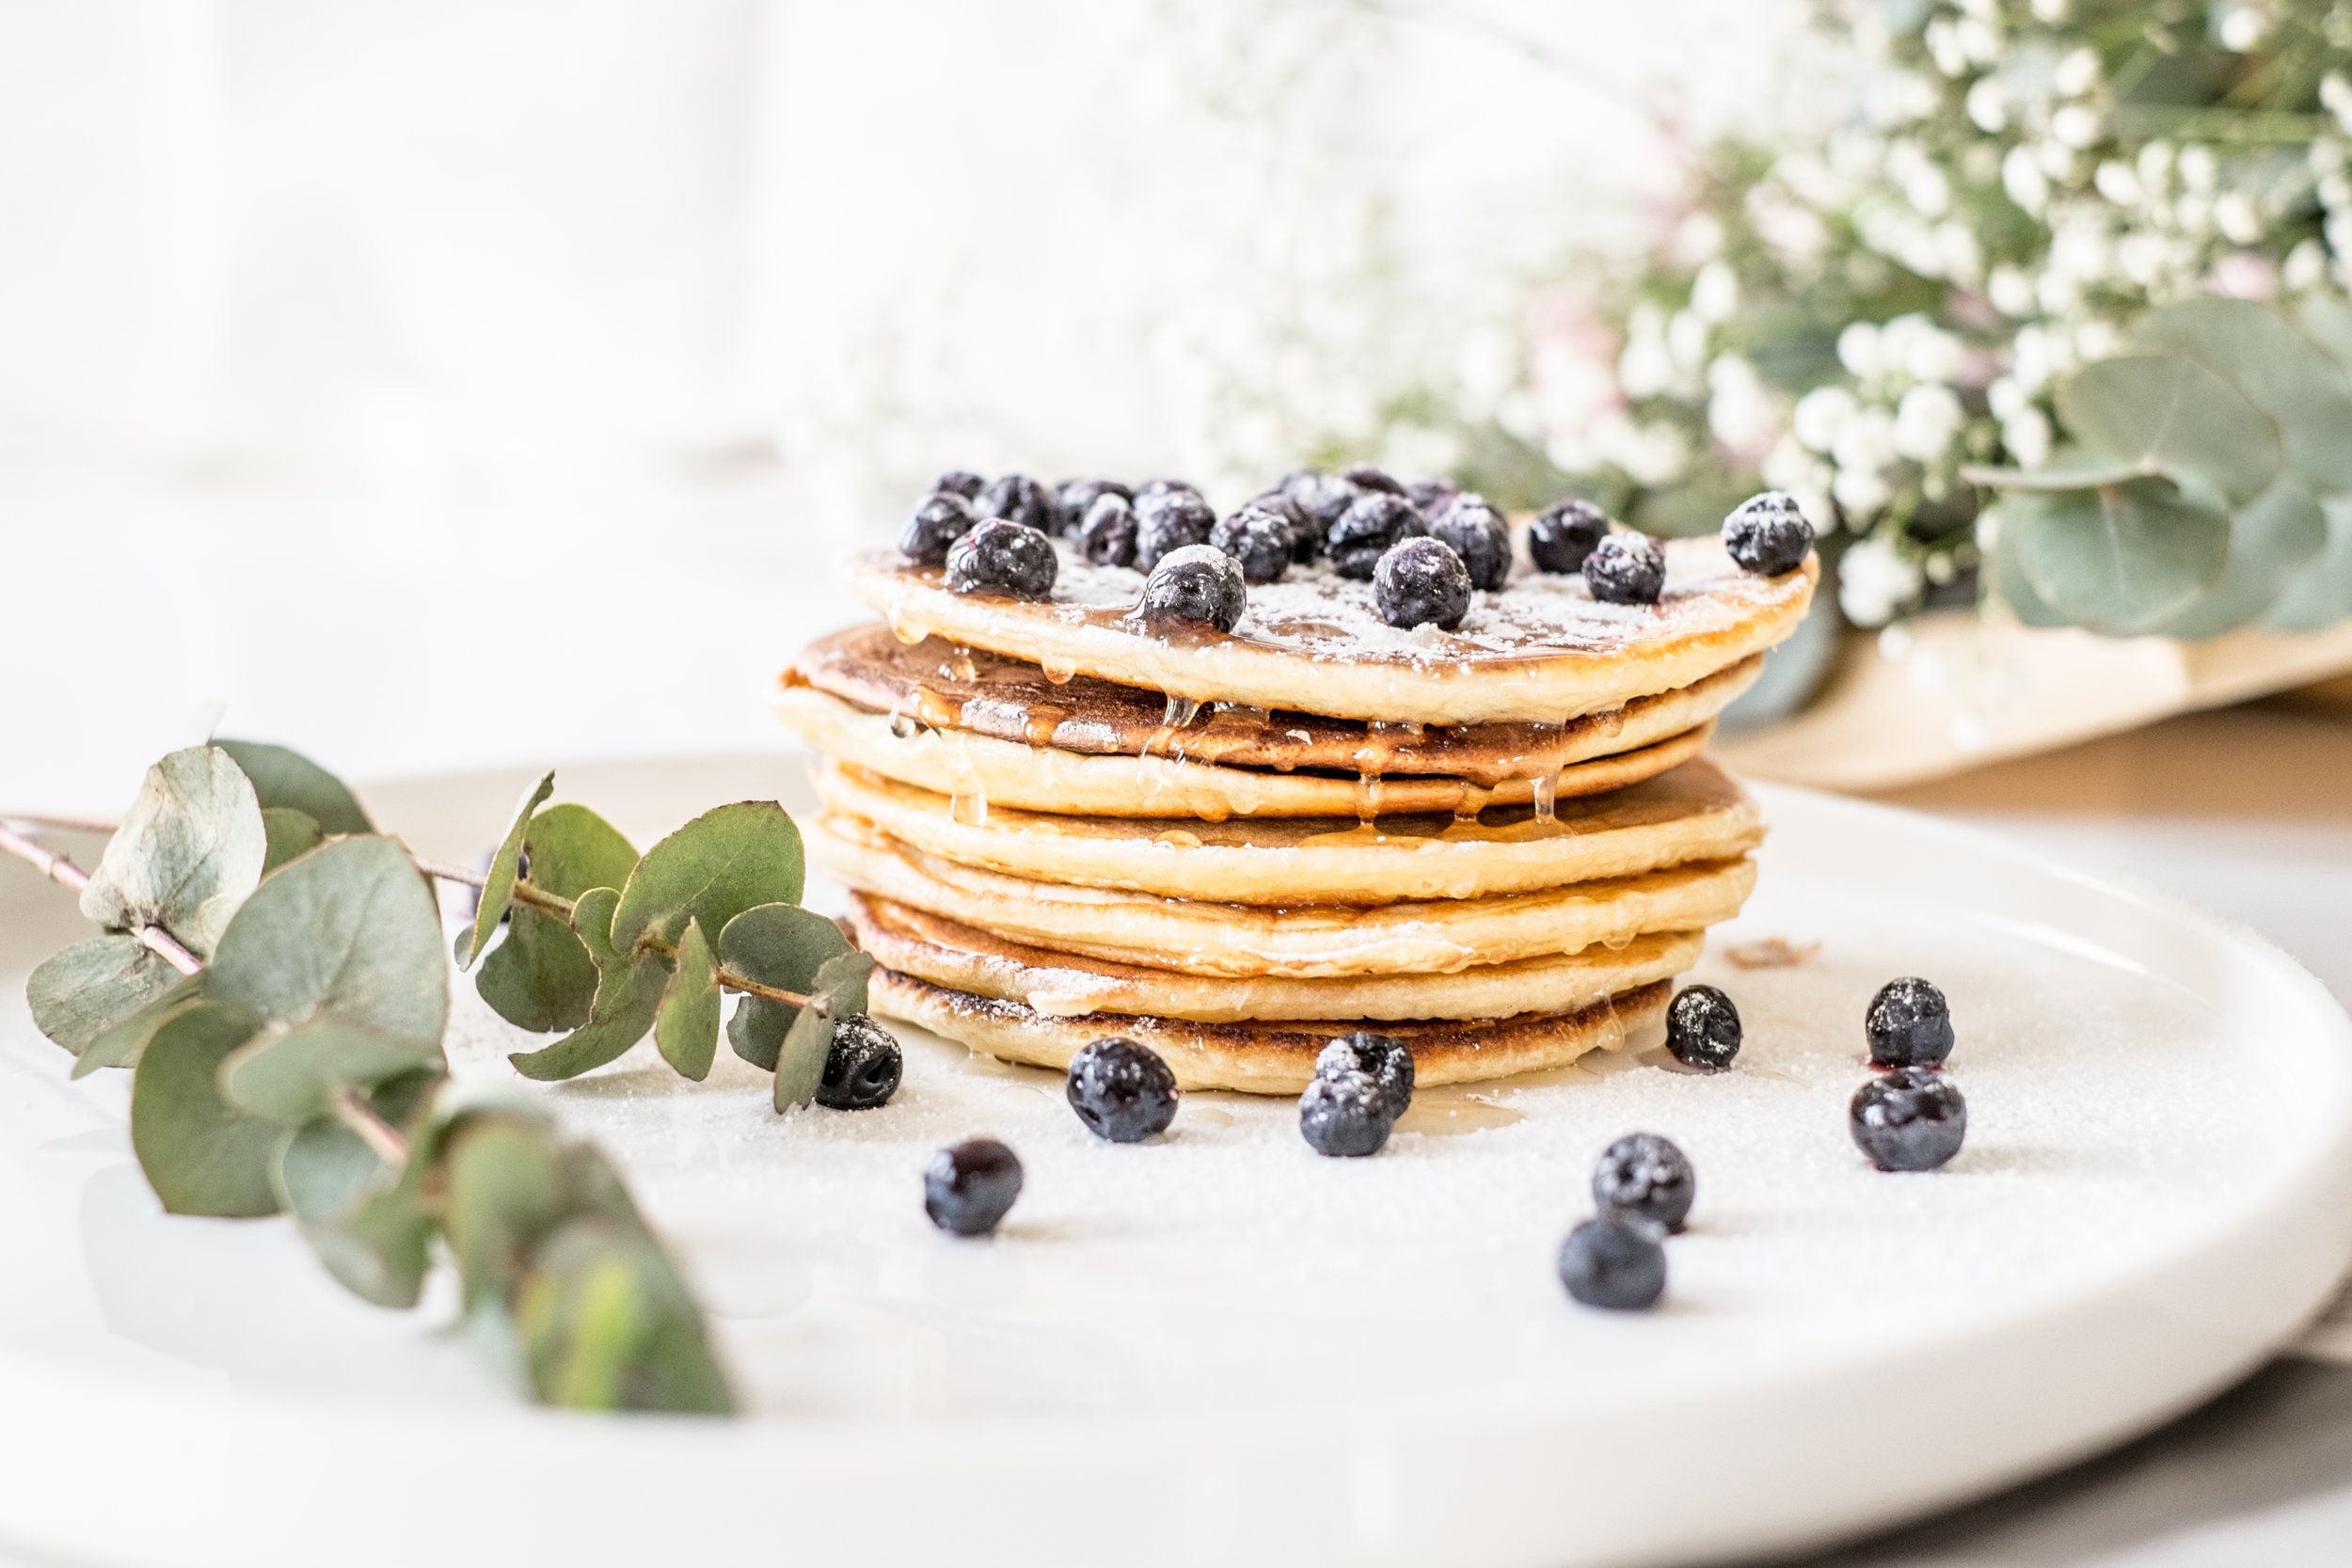 Nordic Honey_Pancakes with Honey and Blueberries_1.jpg